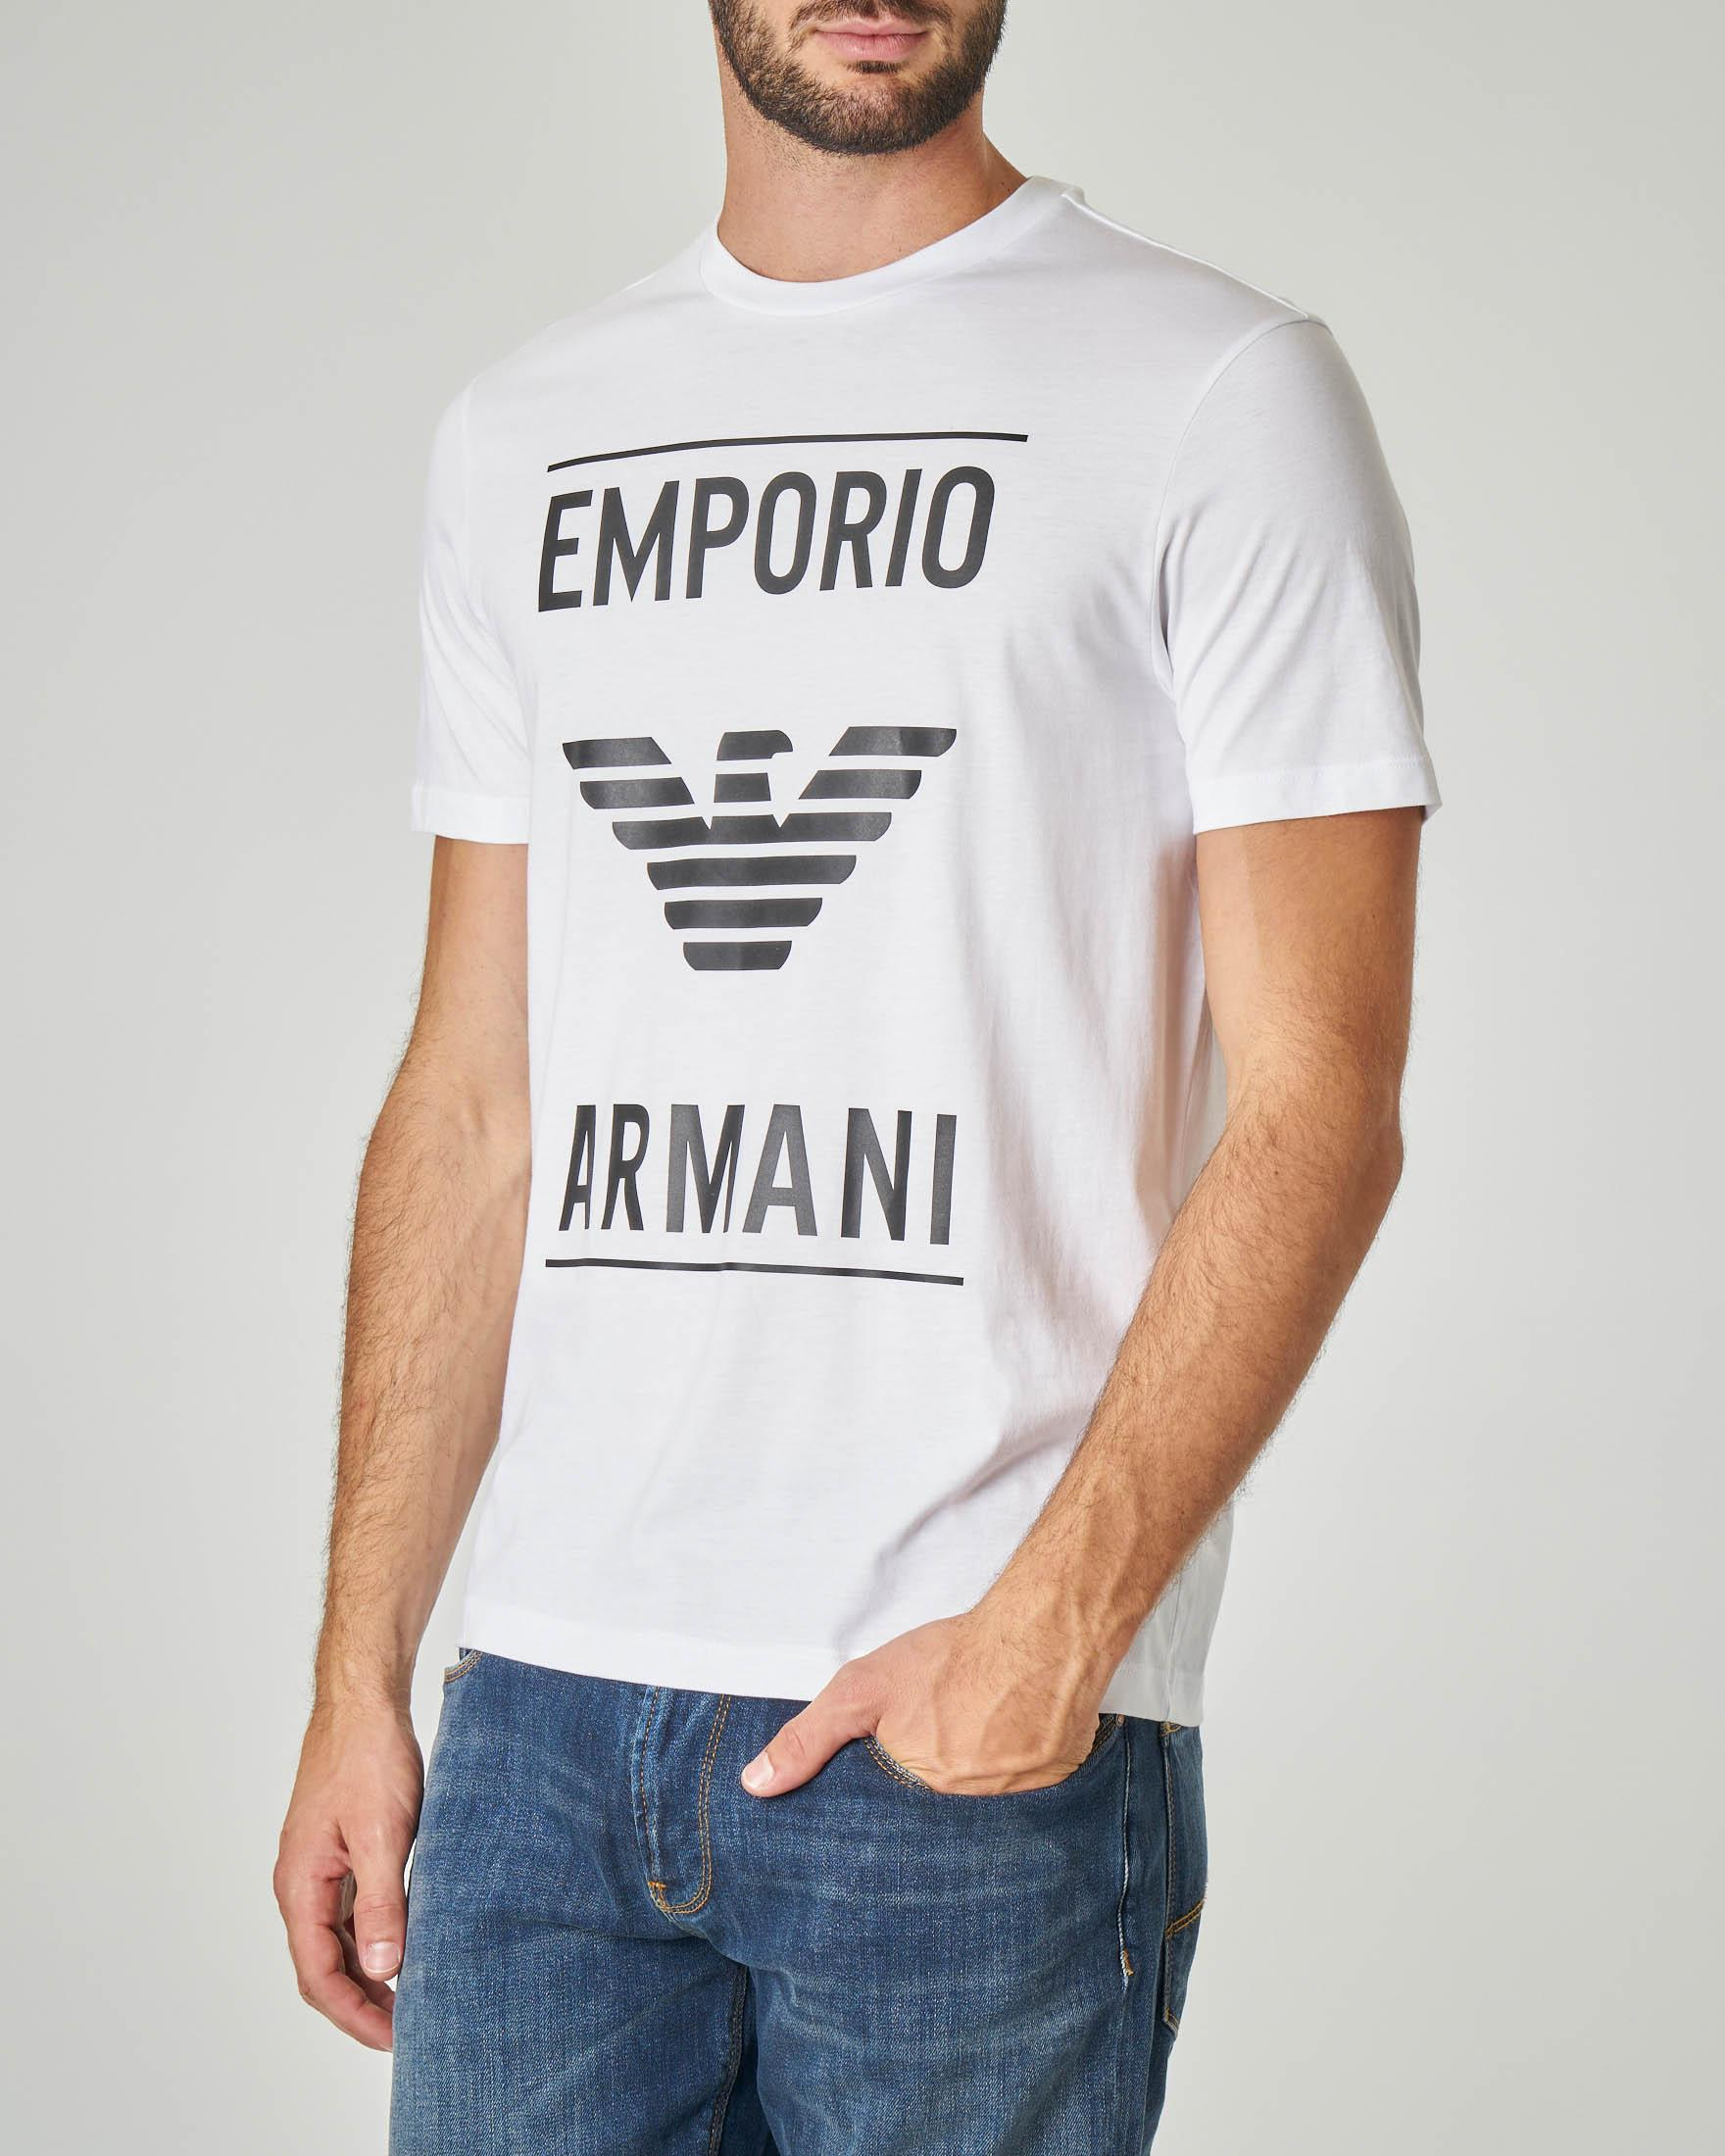 T-shirt bianca con logo e aquila grandi gommati